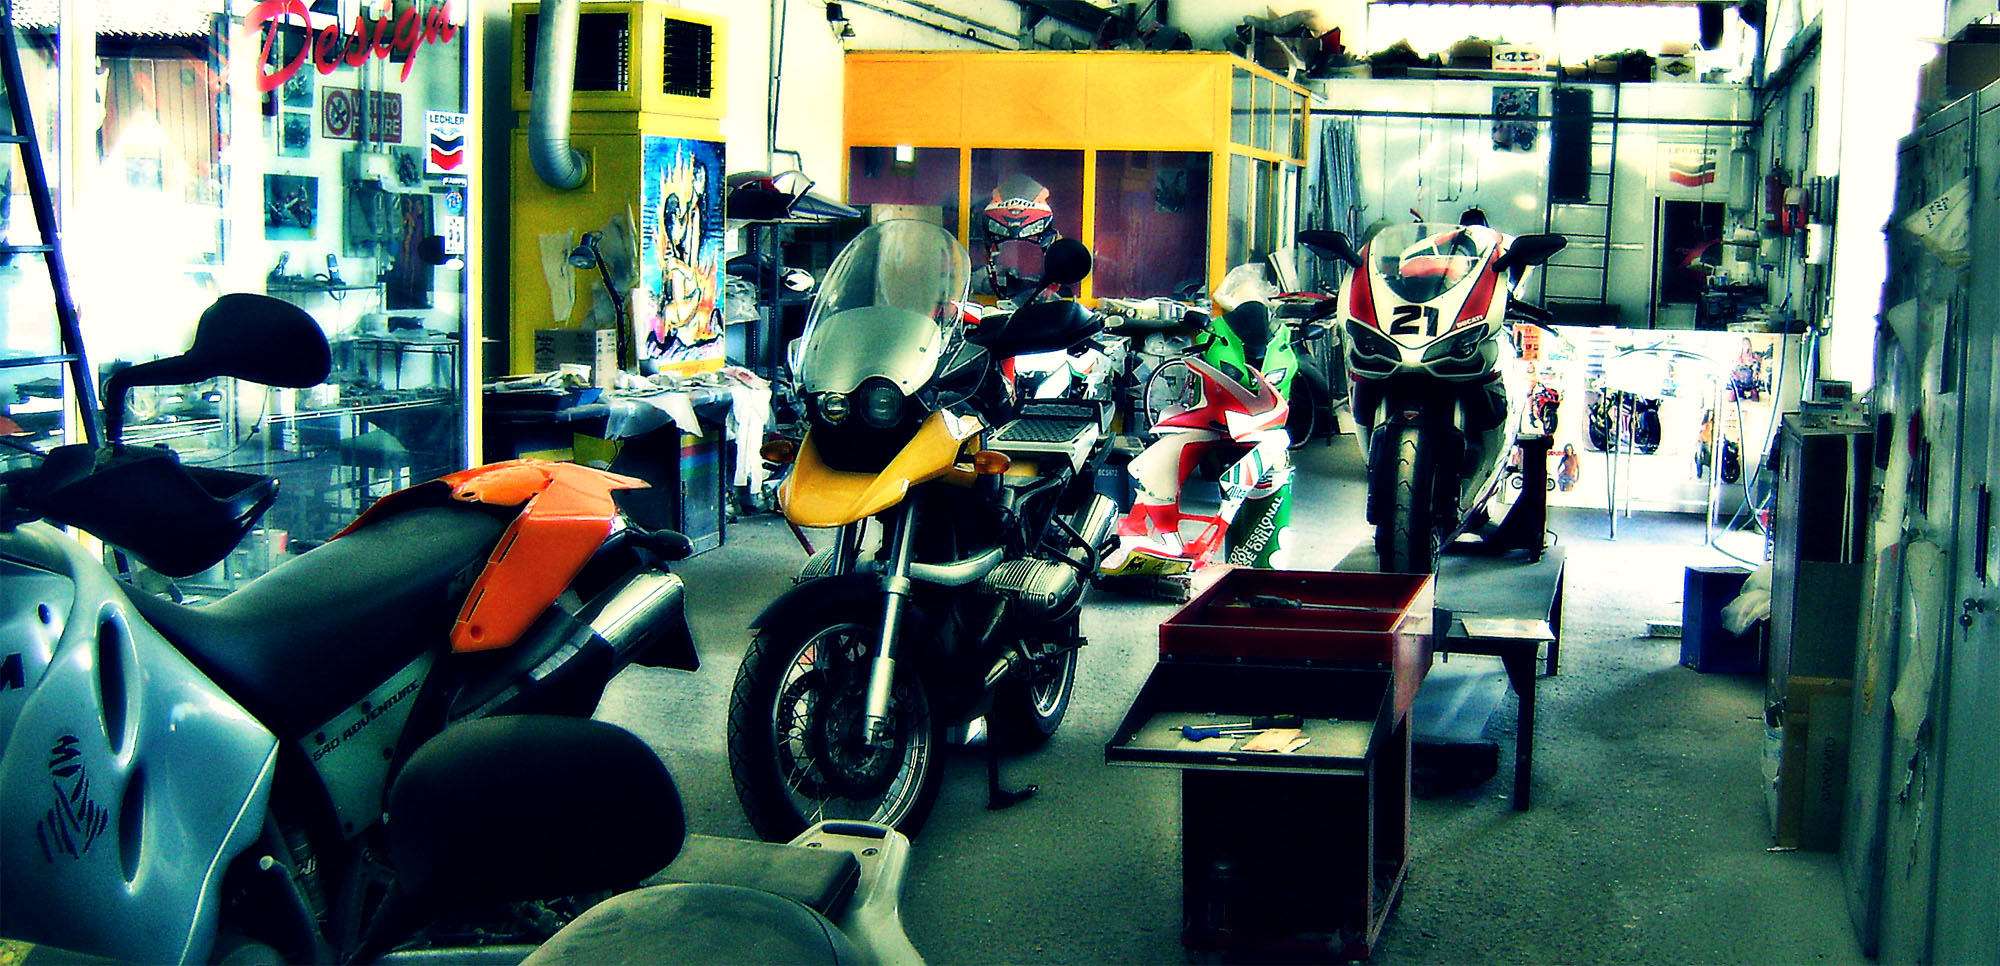 #MOTOSICURA! NEWS PER MOTOCICLISTI